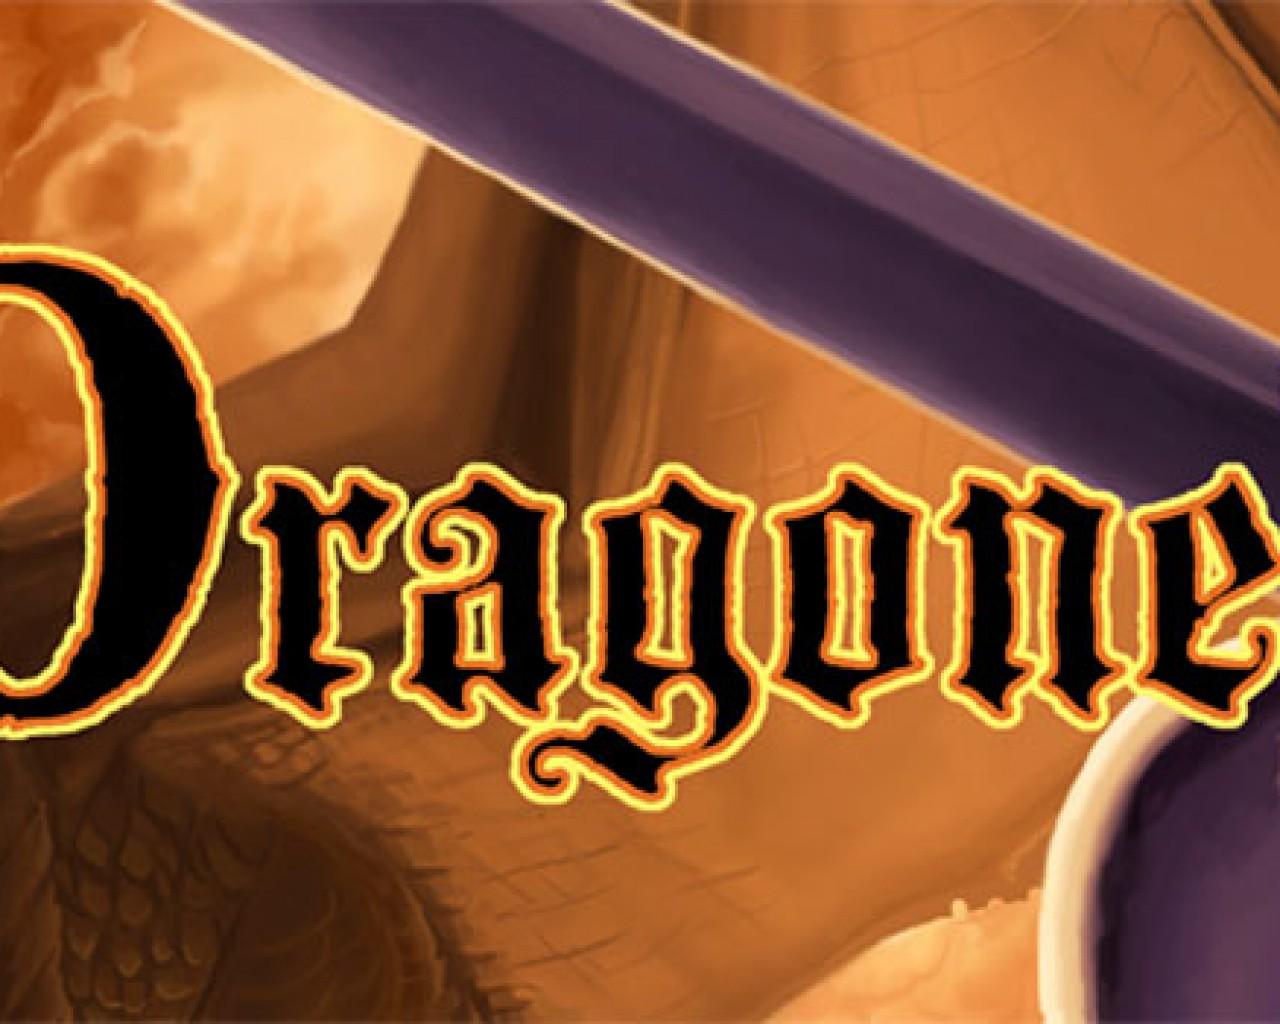 Poster Image for Dragonet